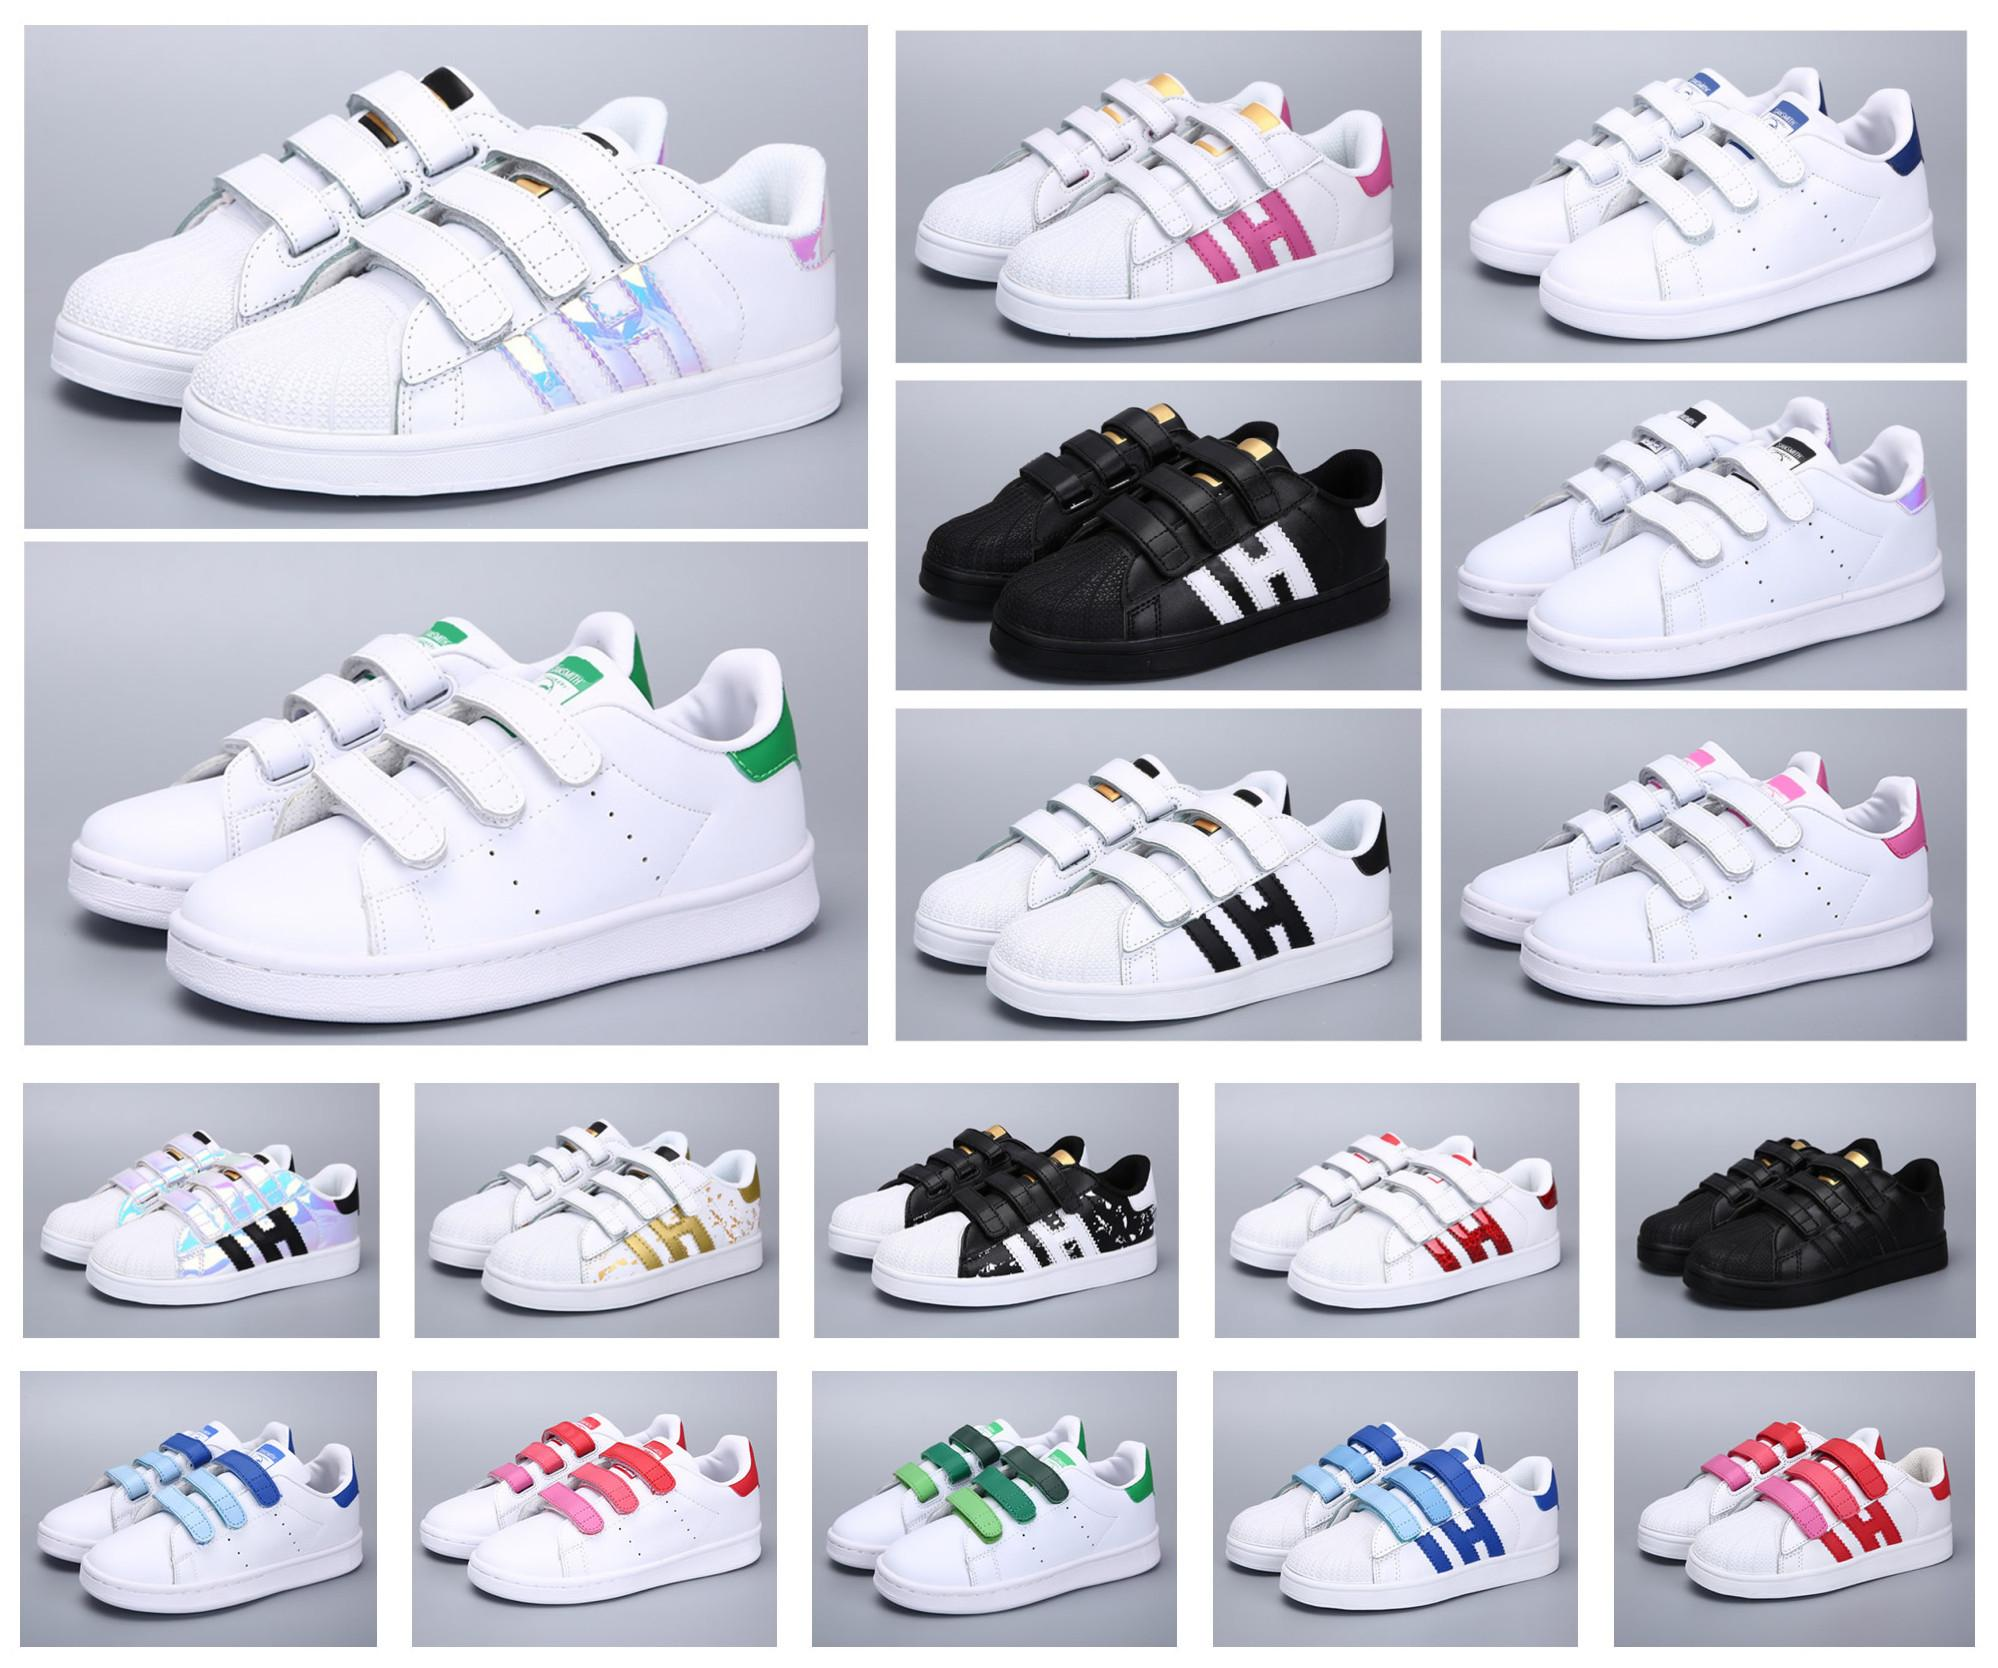 Klassische Jugend Stan Smith Superstar Kinder Mädchen Kind Jungen Baby Kinder Schuhe Casual Sport Größe 24-35